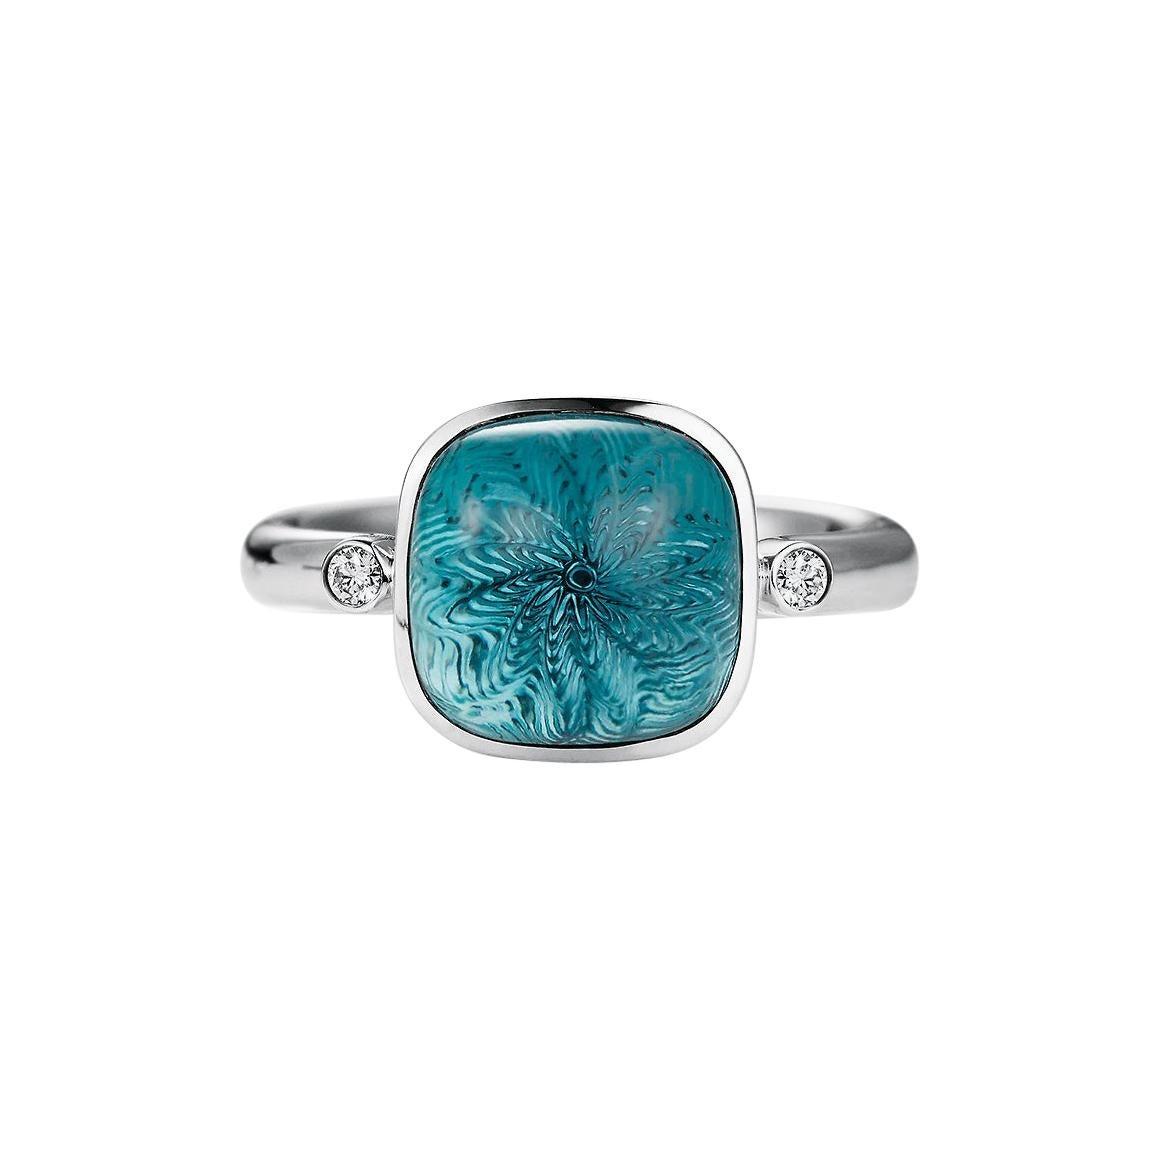 Victor Mayer Era Blue Topaz Ring in 18k White Gold with Diamonds